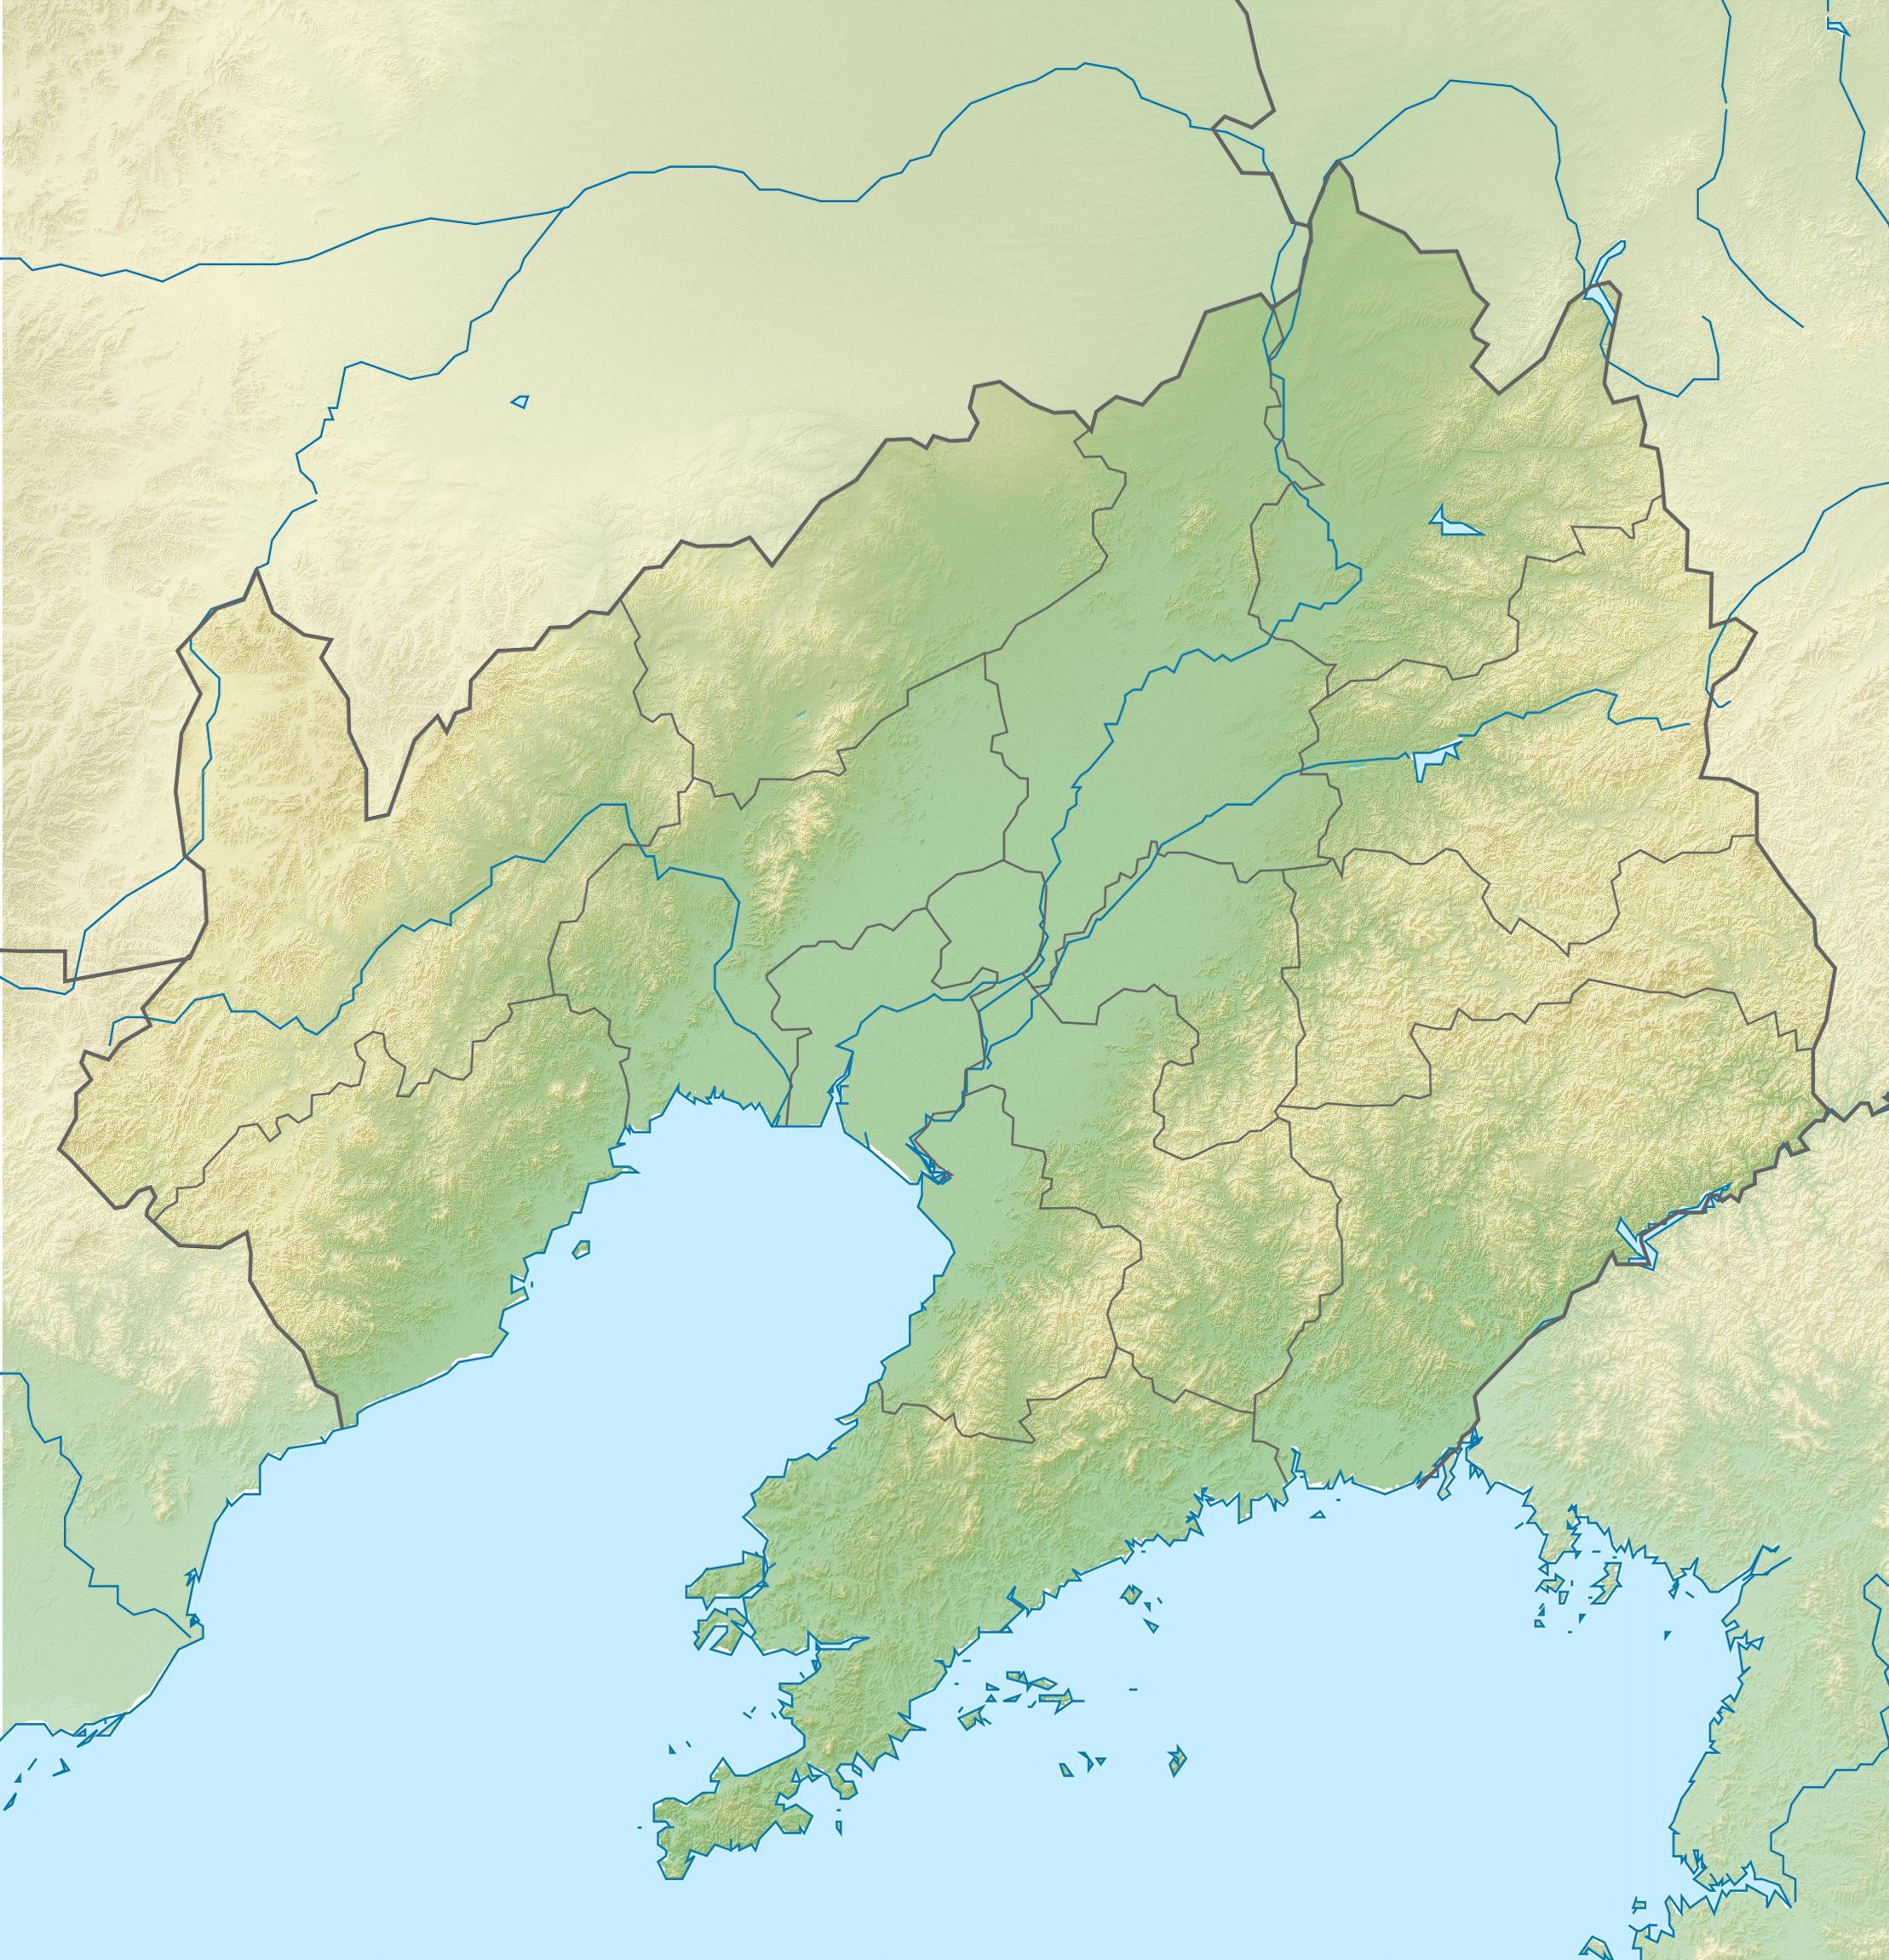 Тайцзыхэ (река) (Ляонин)